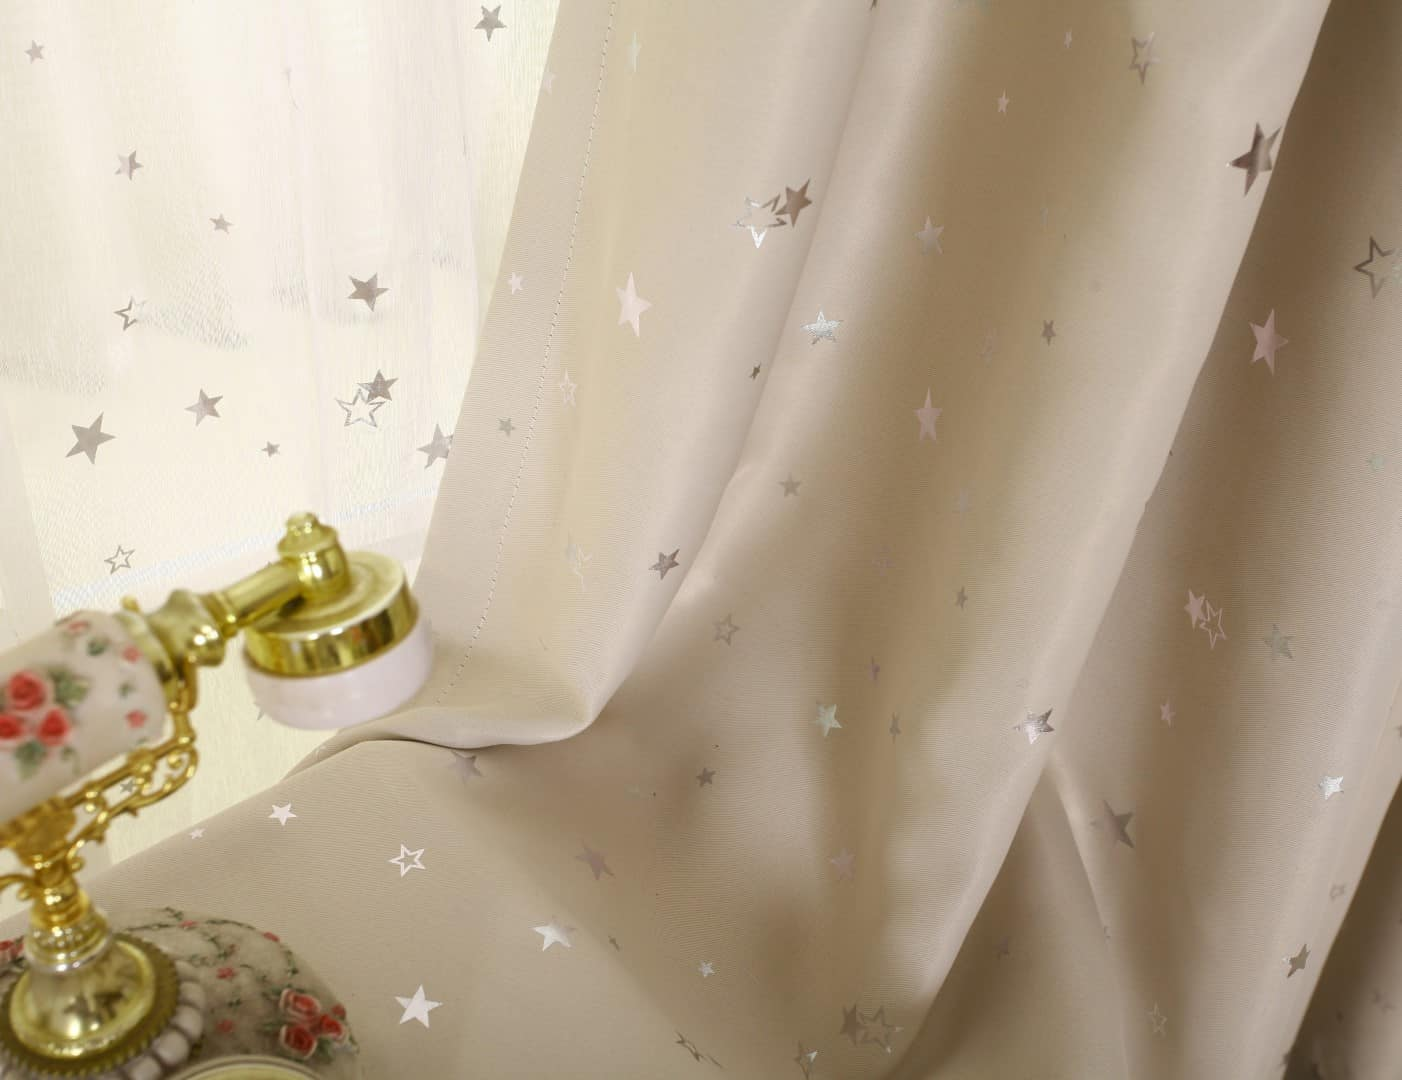 Kinderkamer Gordijnen Sterren : Ster gordijnen lichtgrijs leuke kindergordijnen